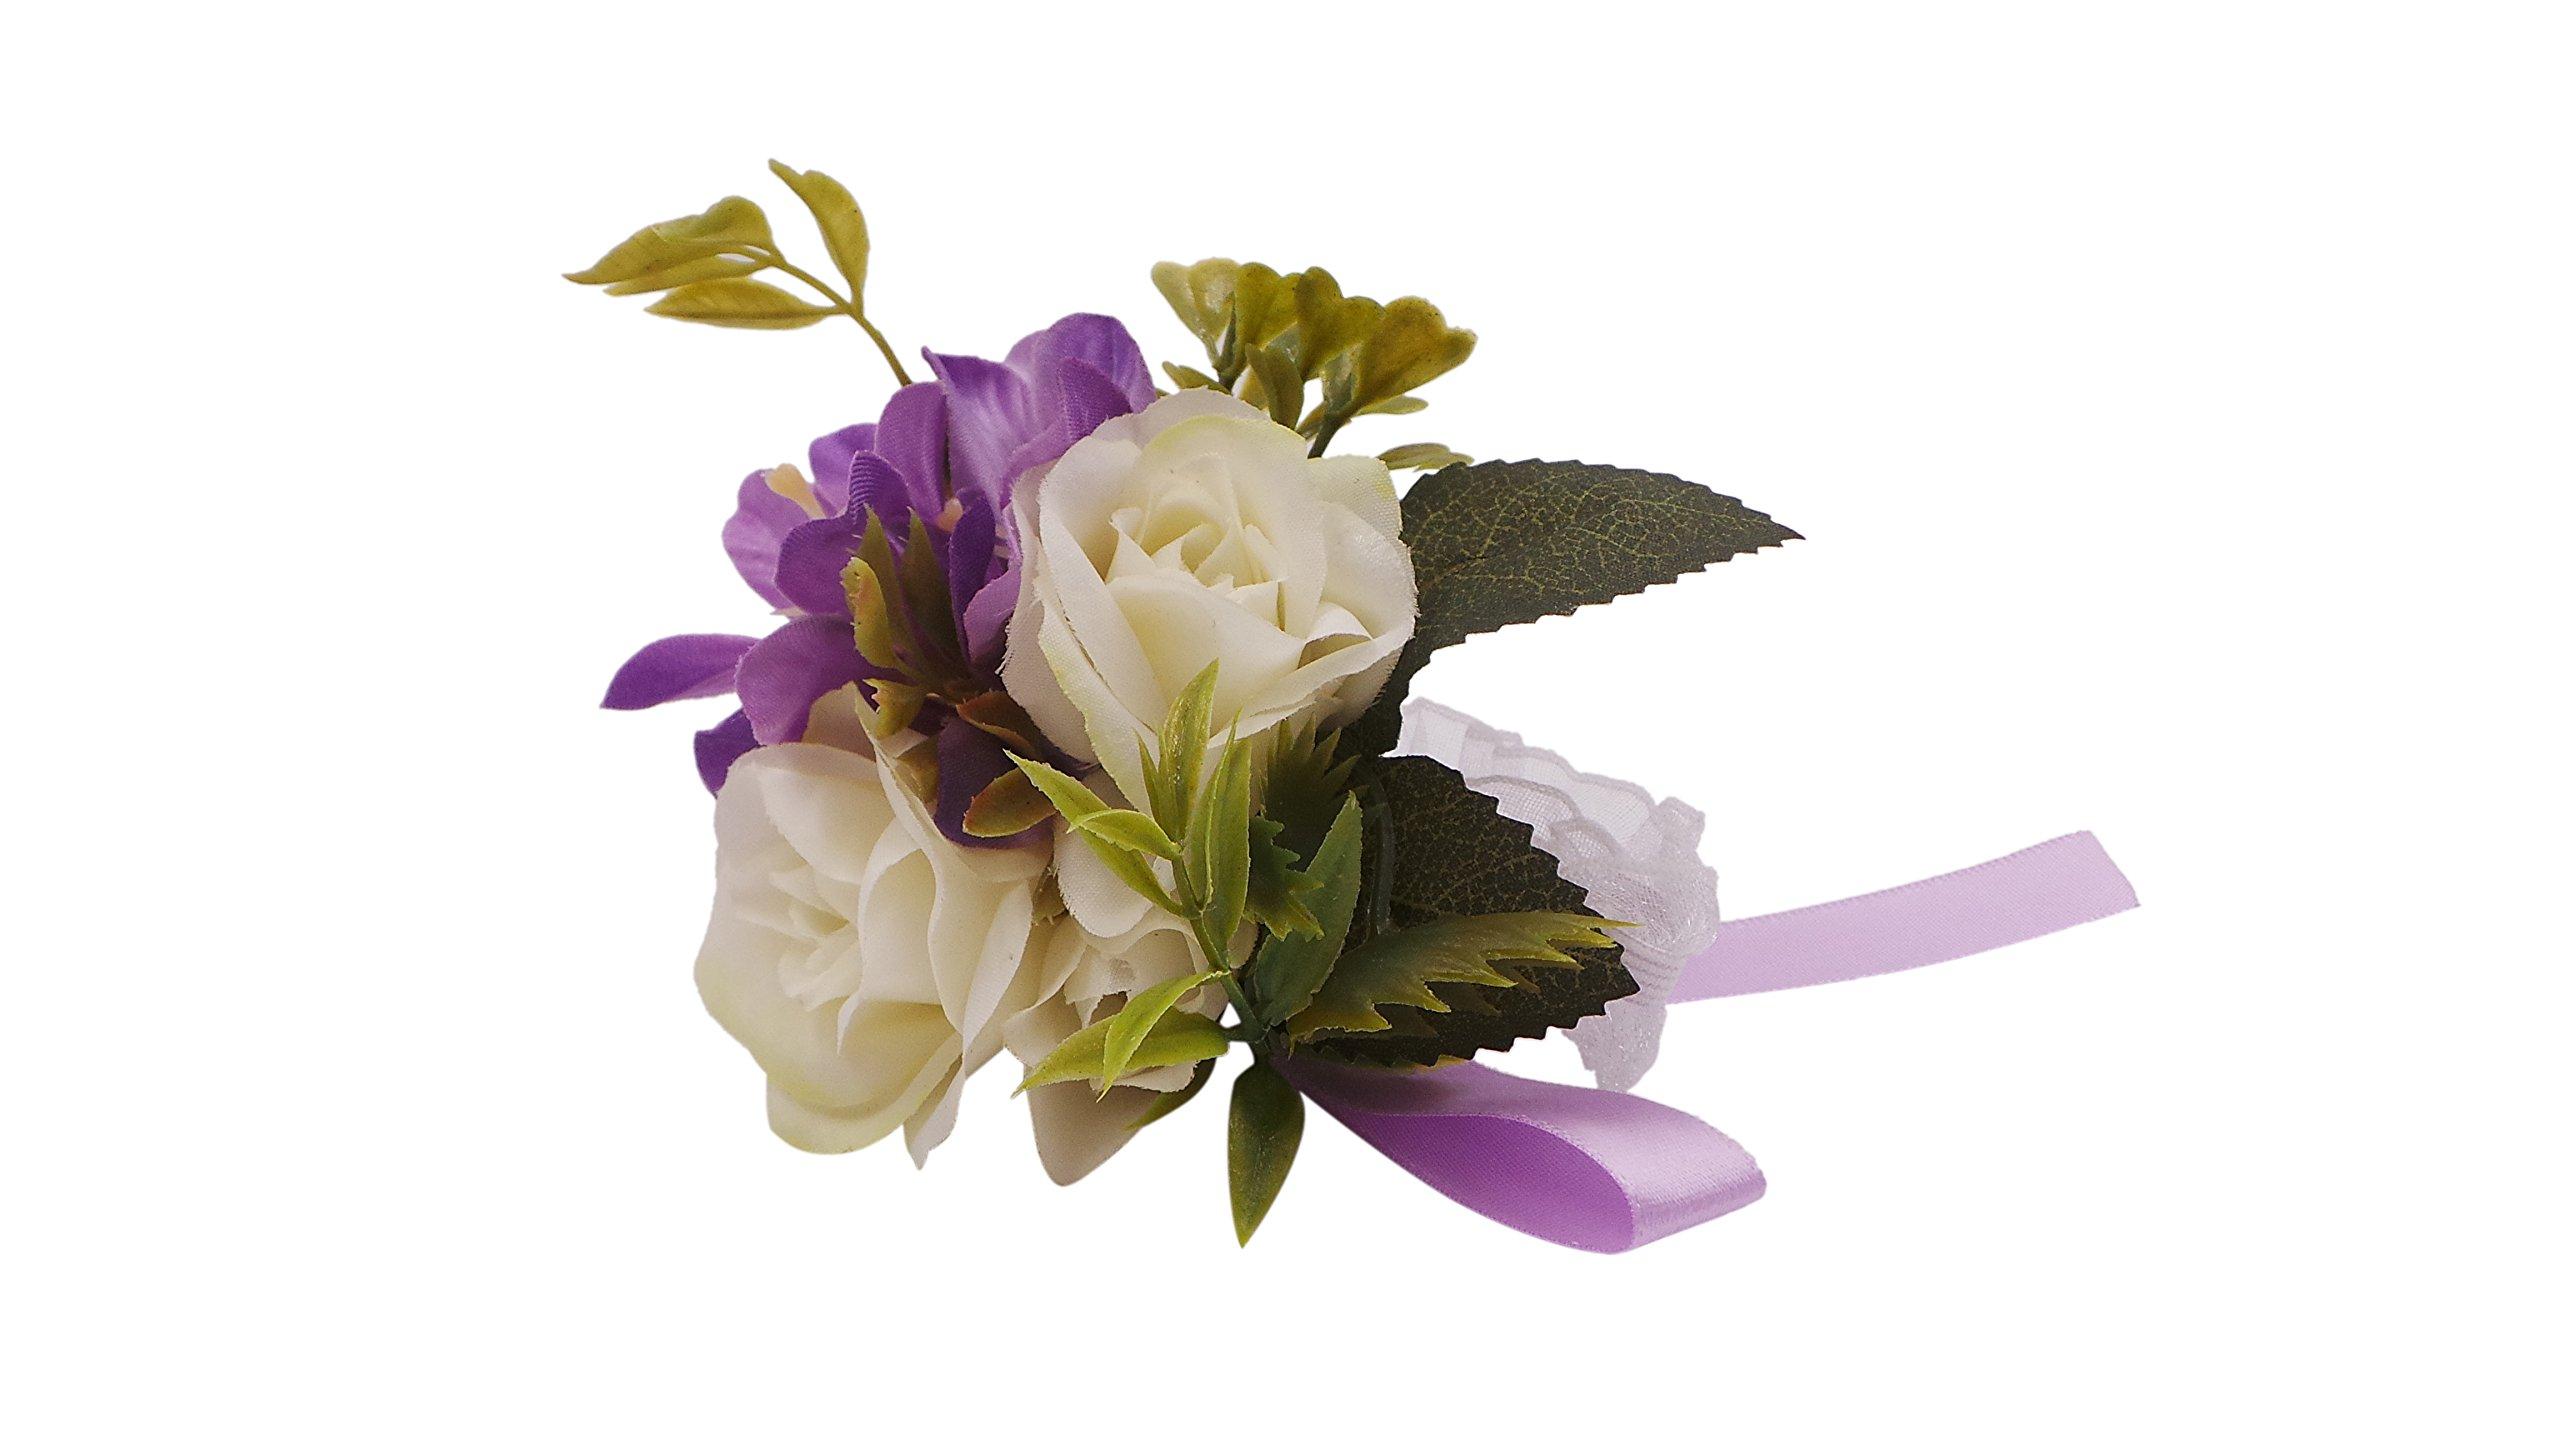 Abbie-Home-Wedding-Wrist-Corsage-Brooch-Boutonniere-Set-Party-Prom-Hand-Flower-Decor